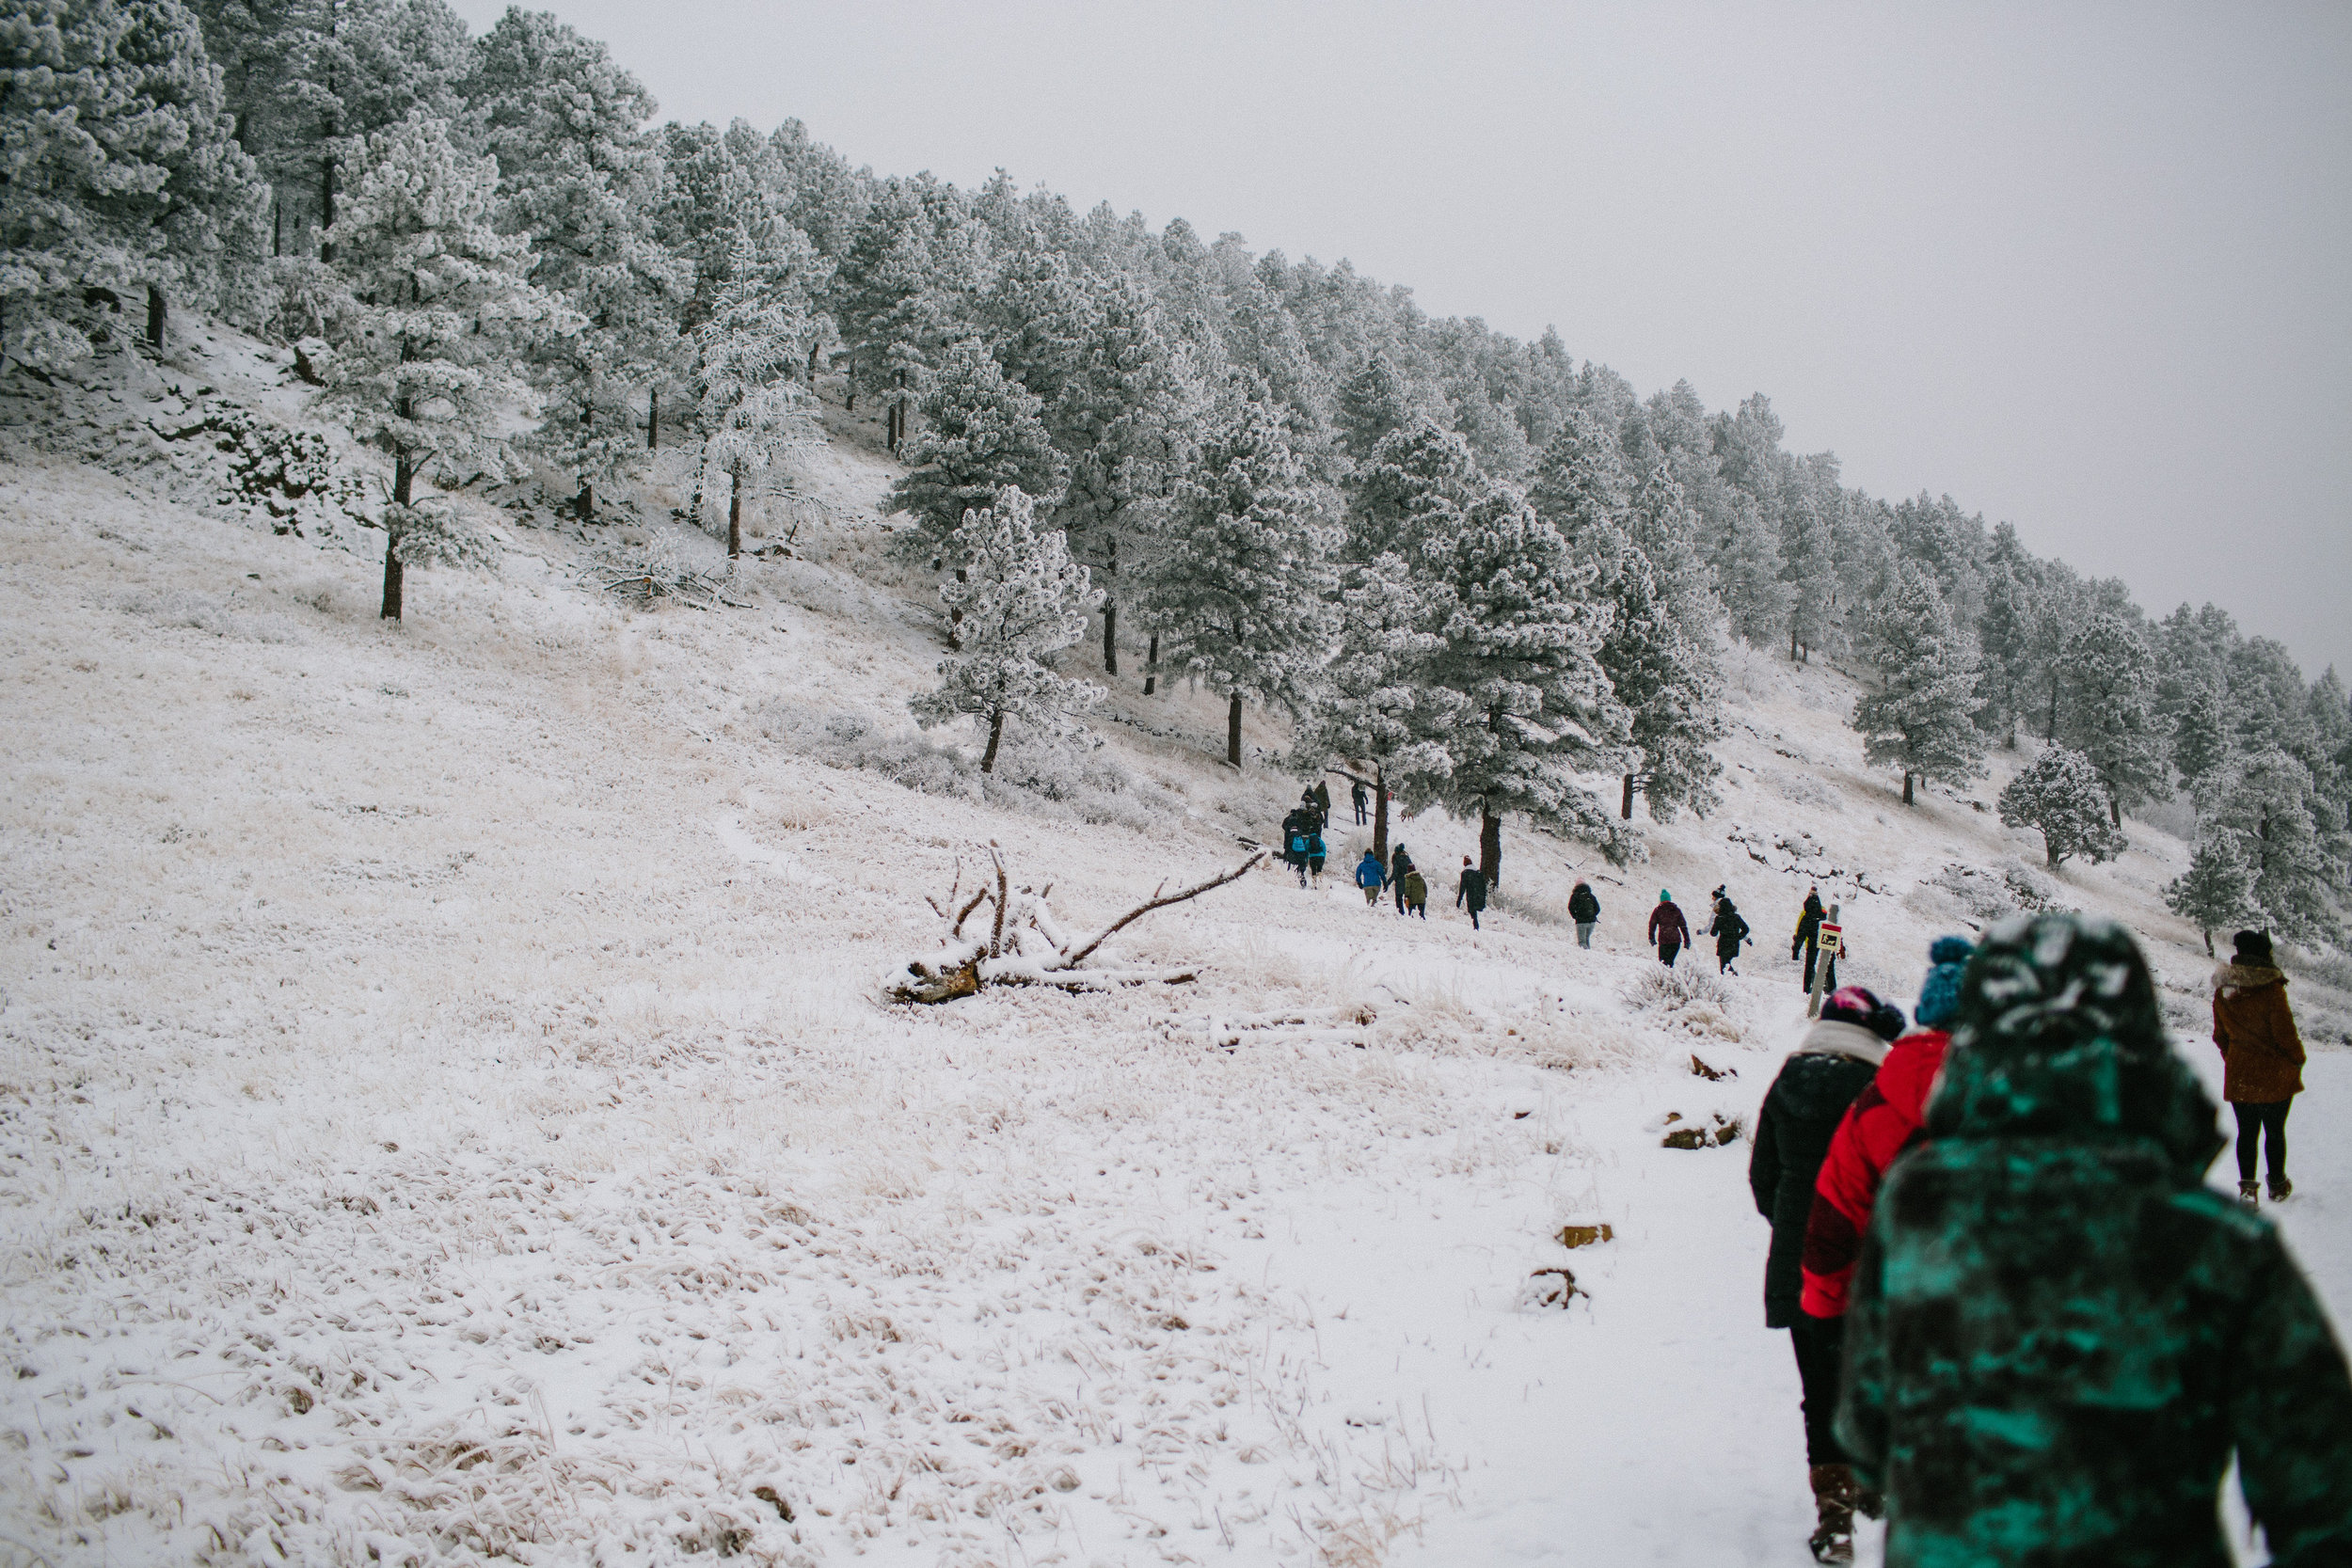 Goals hike in Boulder with Folk Rebellion-goals folk-0082.jpg